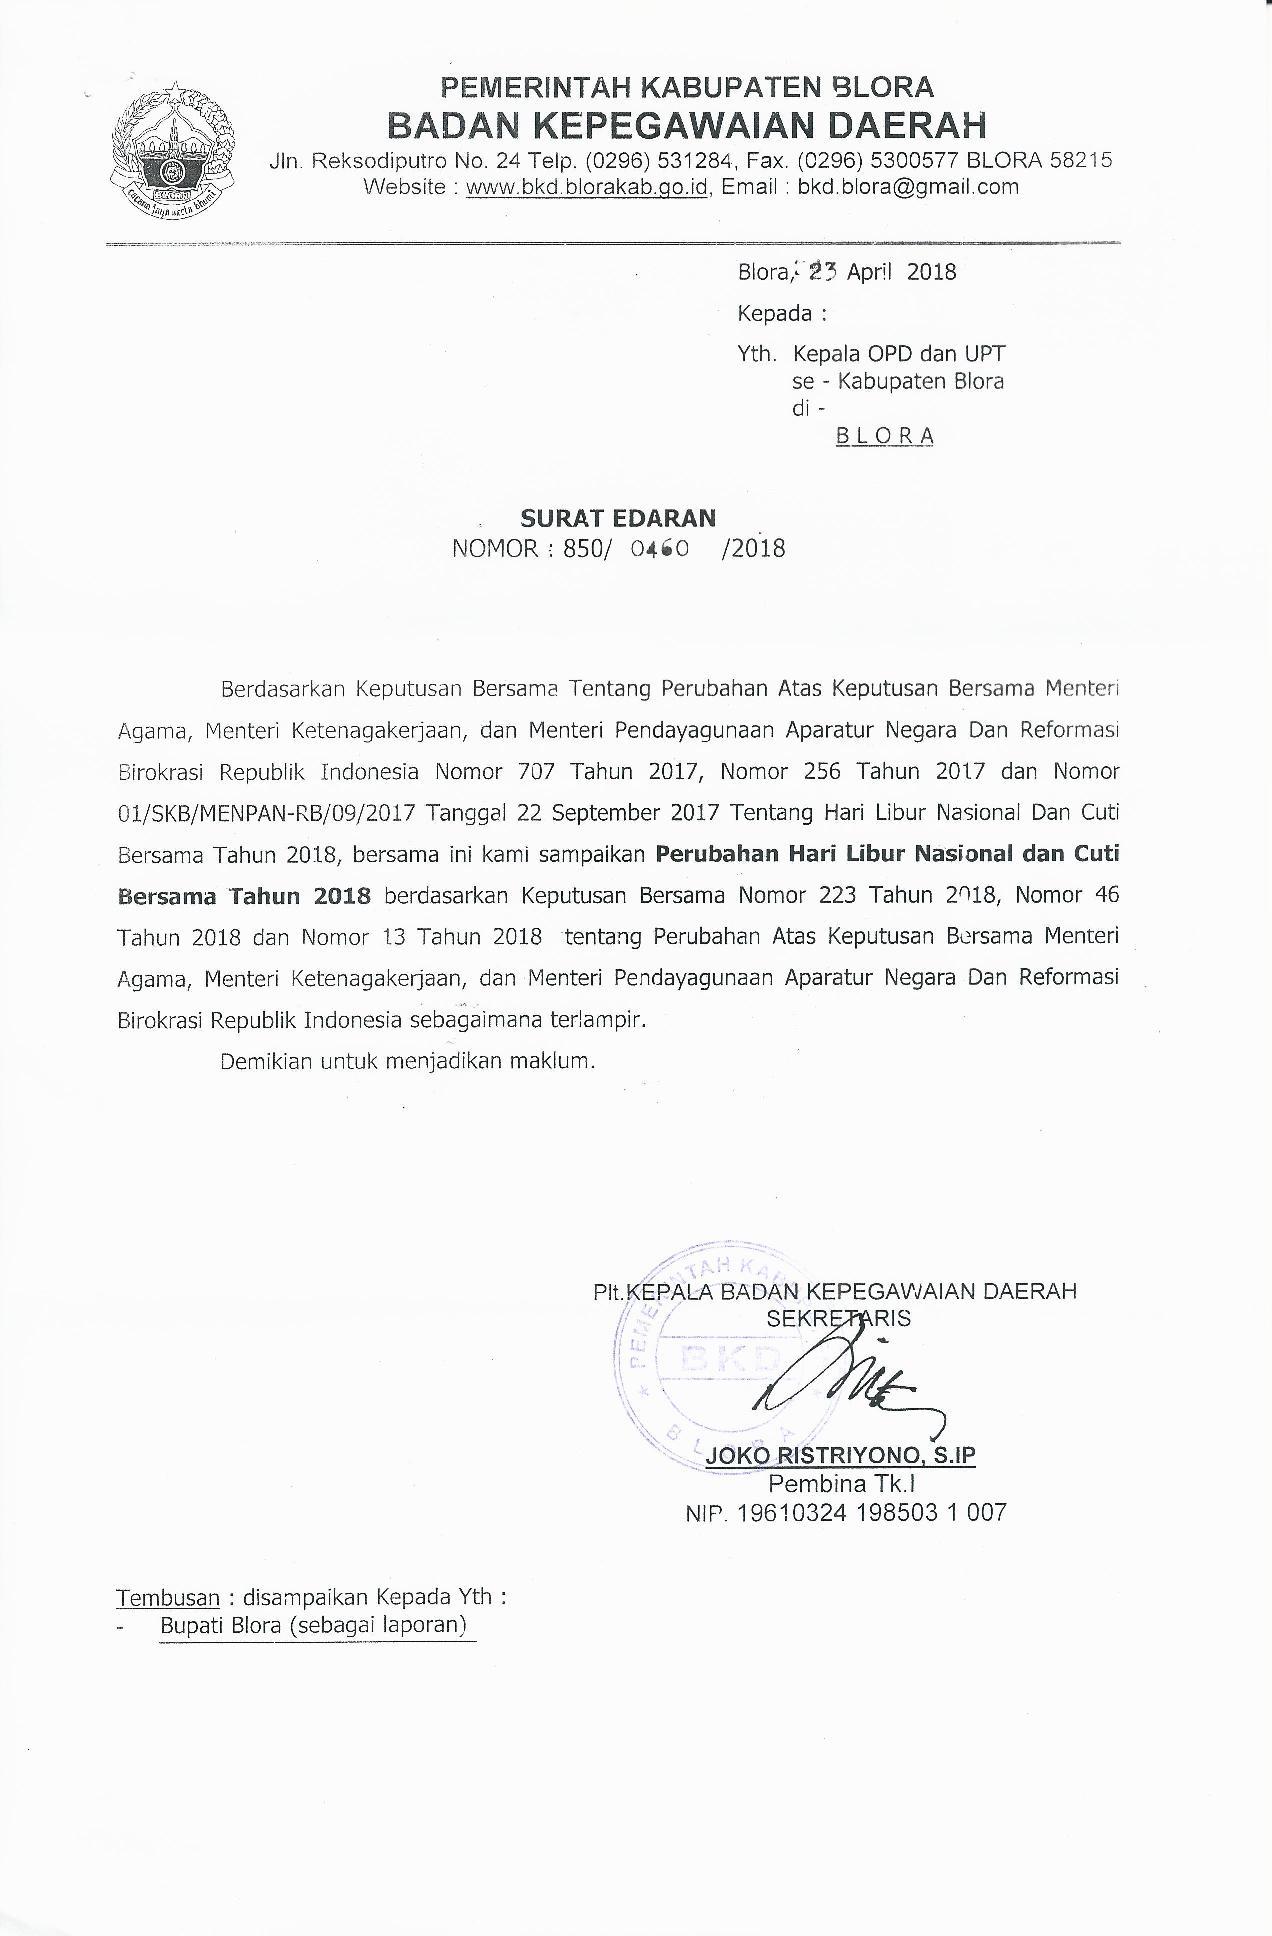 Surat Edaran Perubahan Hari Libur Nasional Dan Cuti Bersama